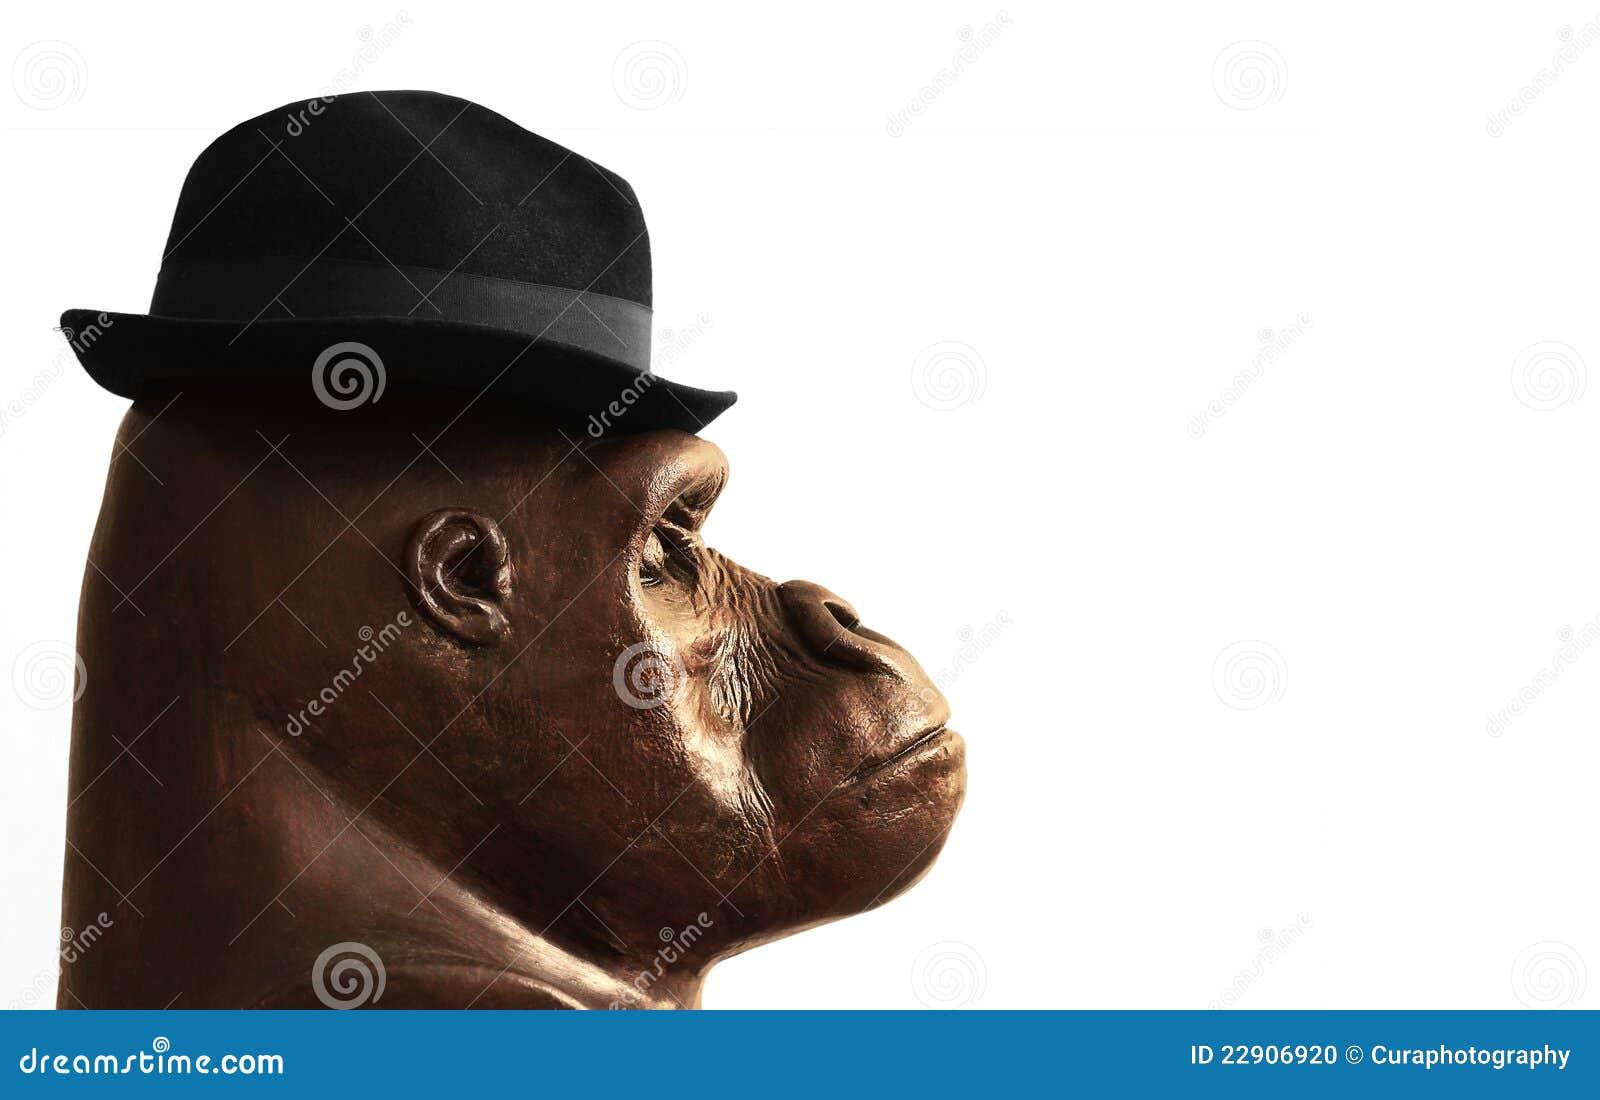 gorilla in hat stock photo image 22906920